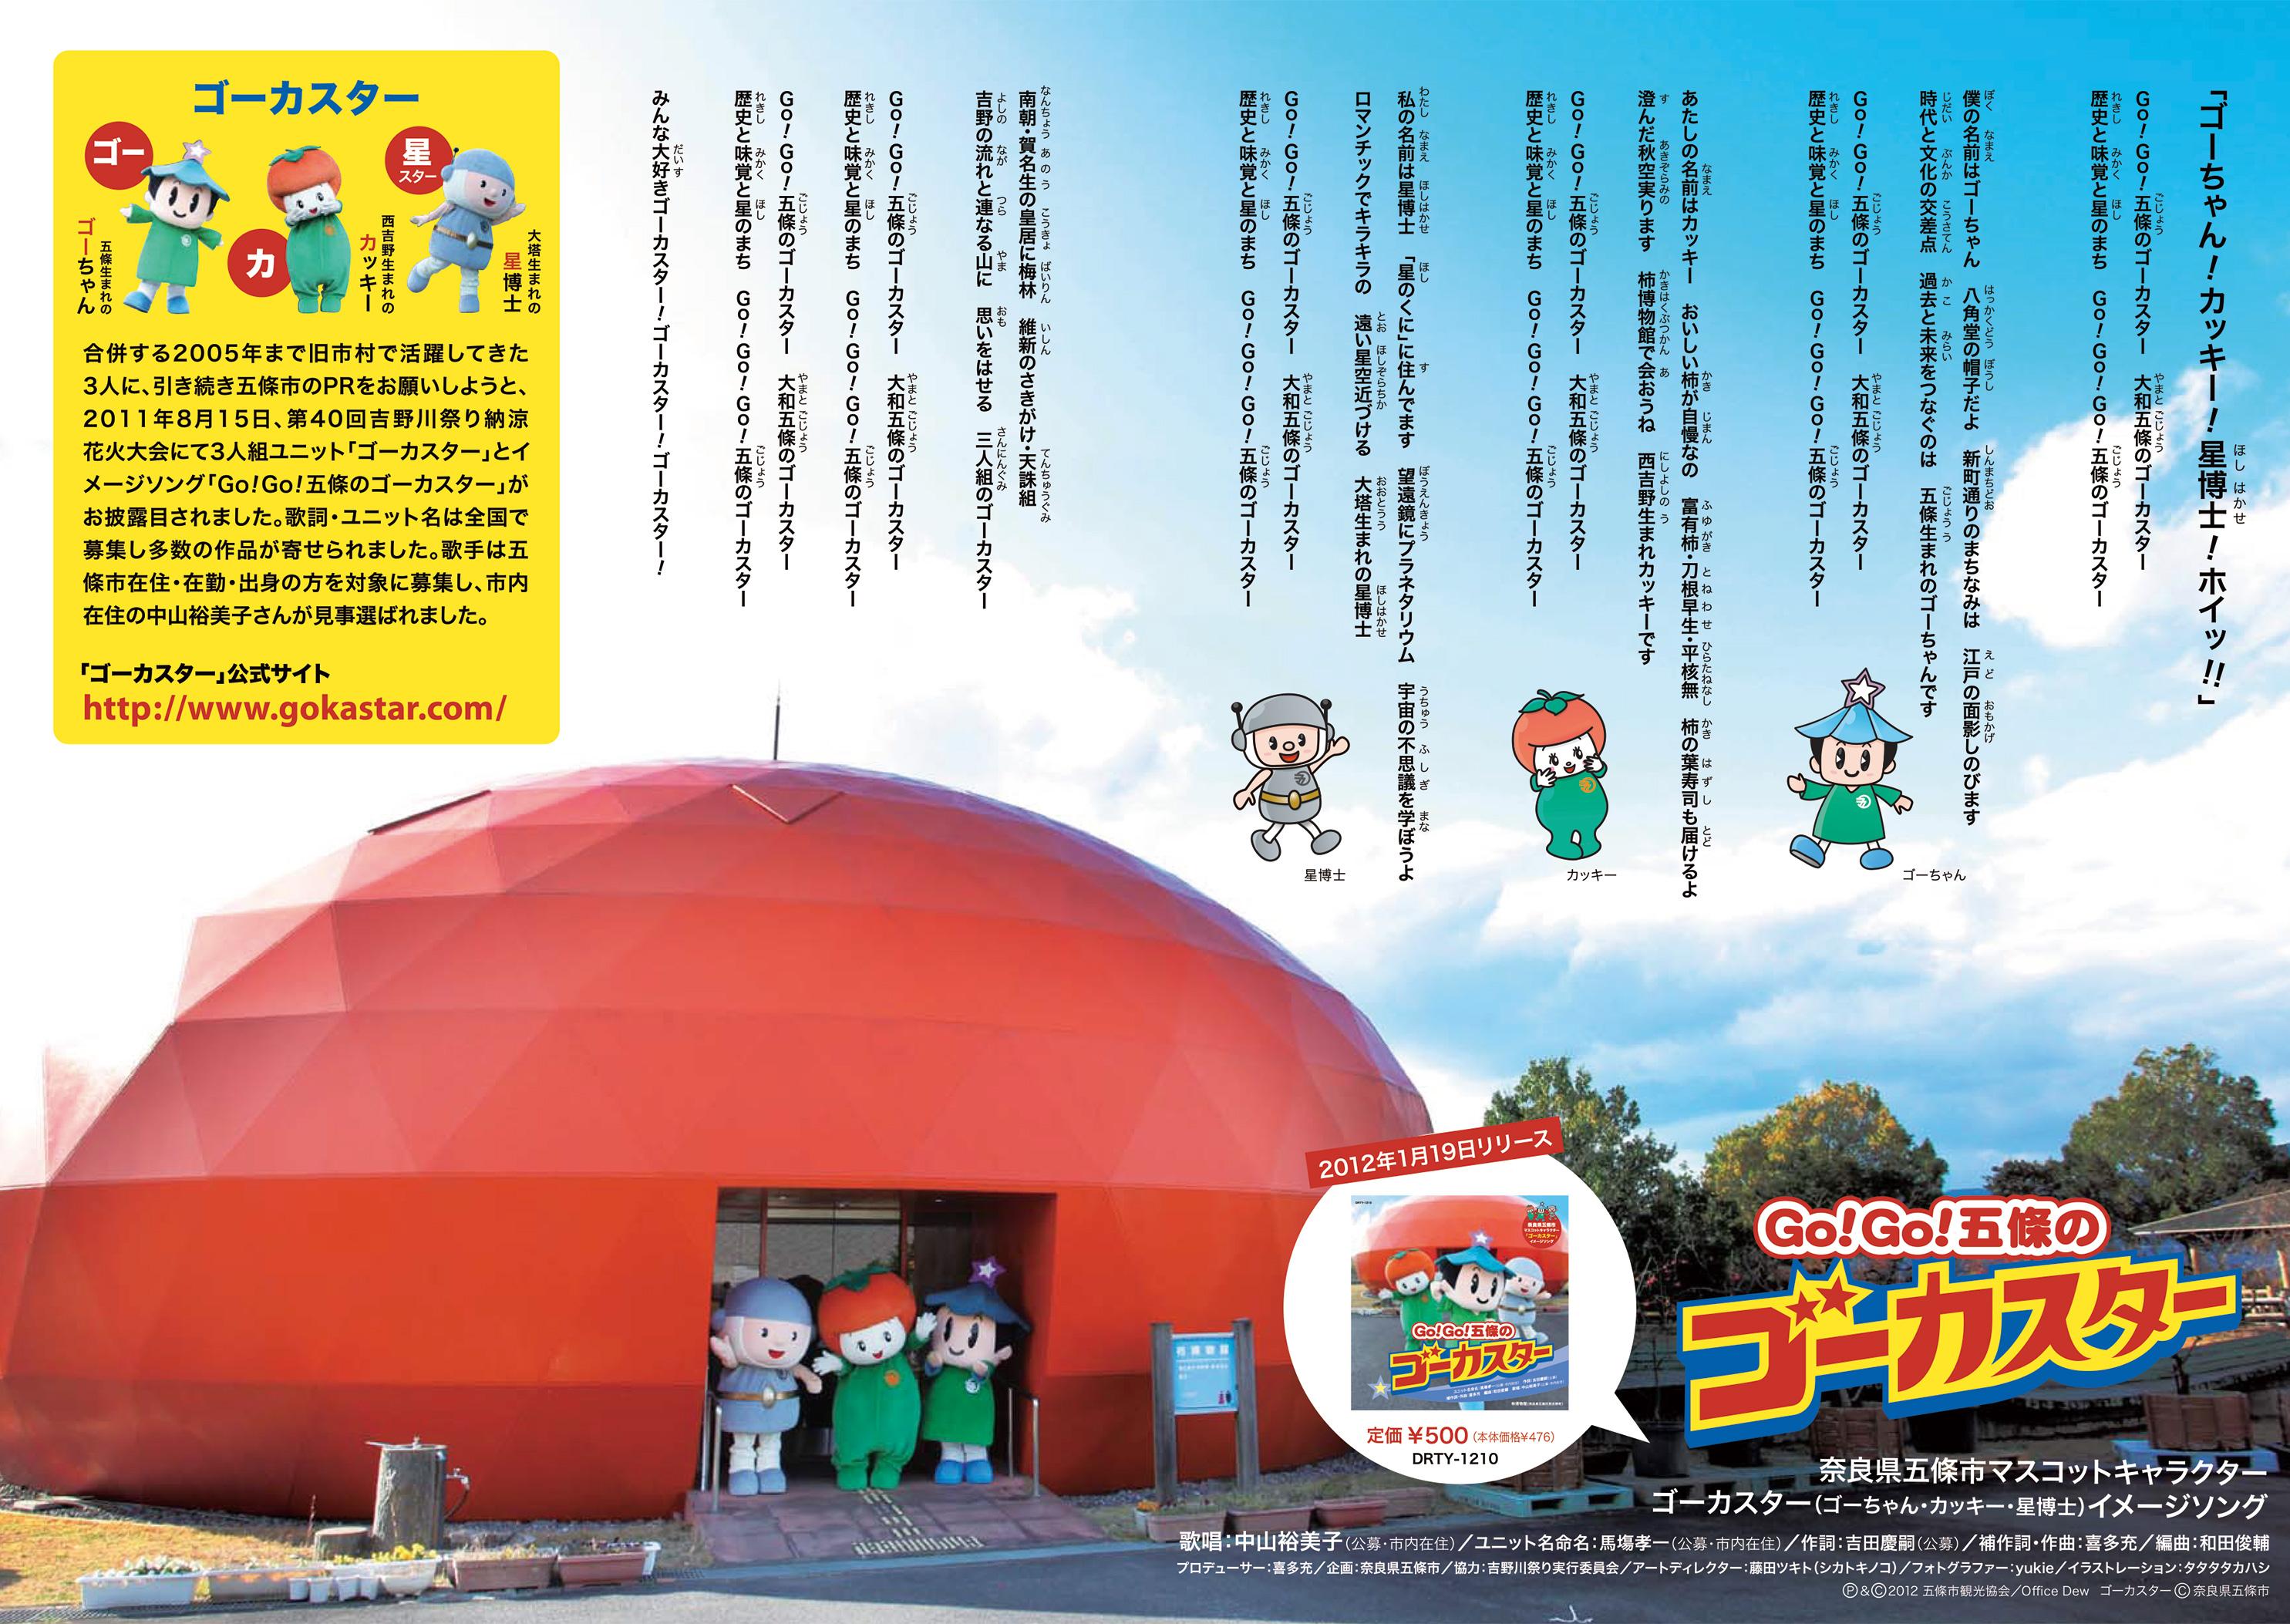 GO!GO!五條のゴーカスター|2012.1.19 イメージソングCD(奈良県五條市)